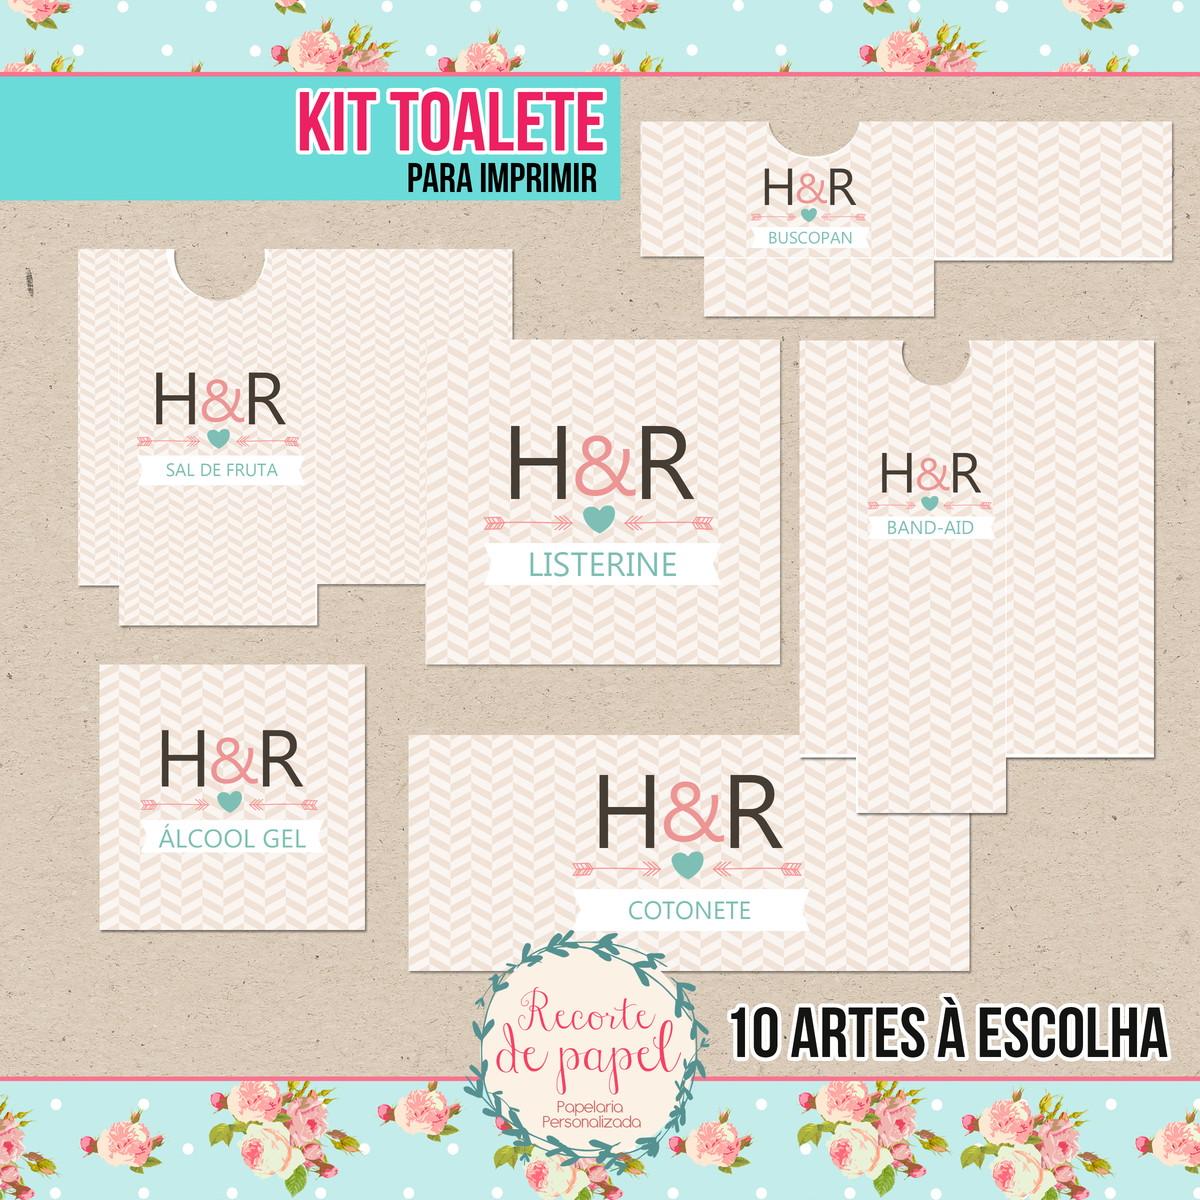 Kit Toalete Para Imprimir No Elo7 Recorte De Papel 645b6e